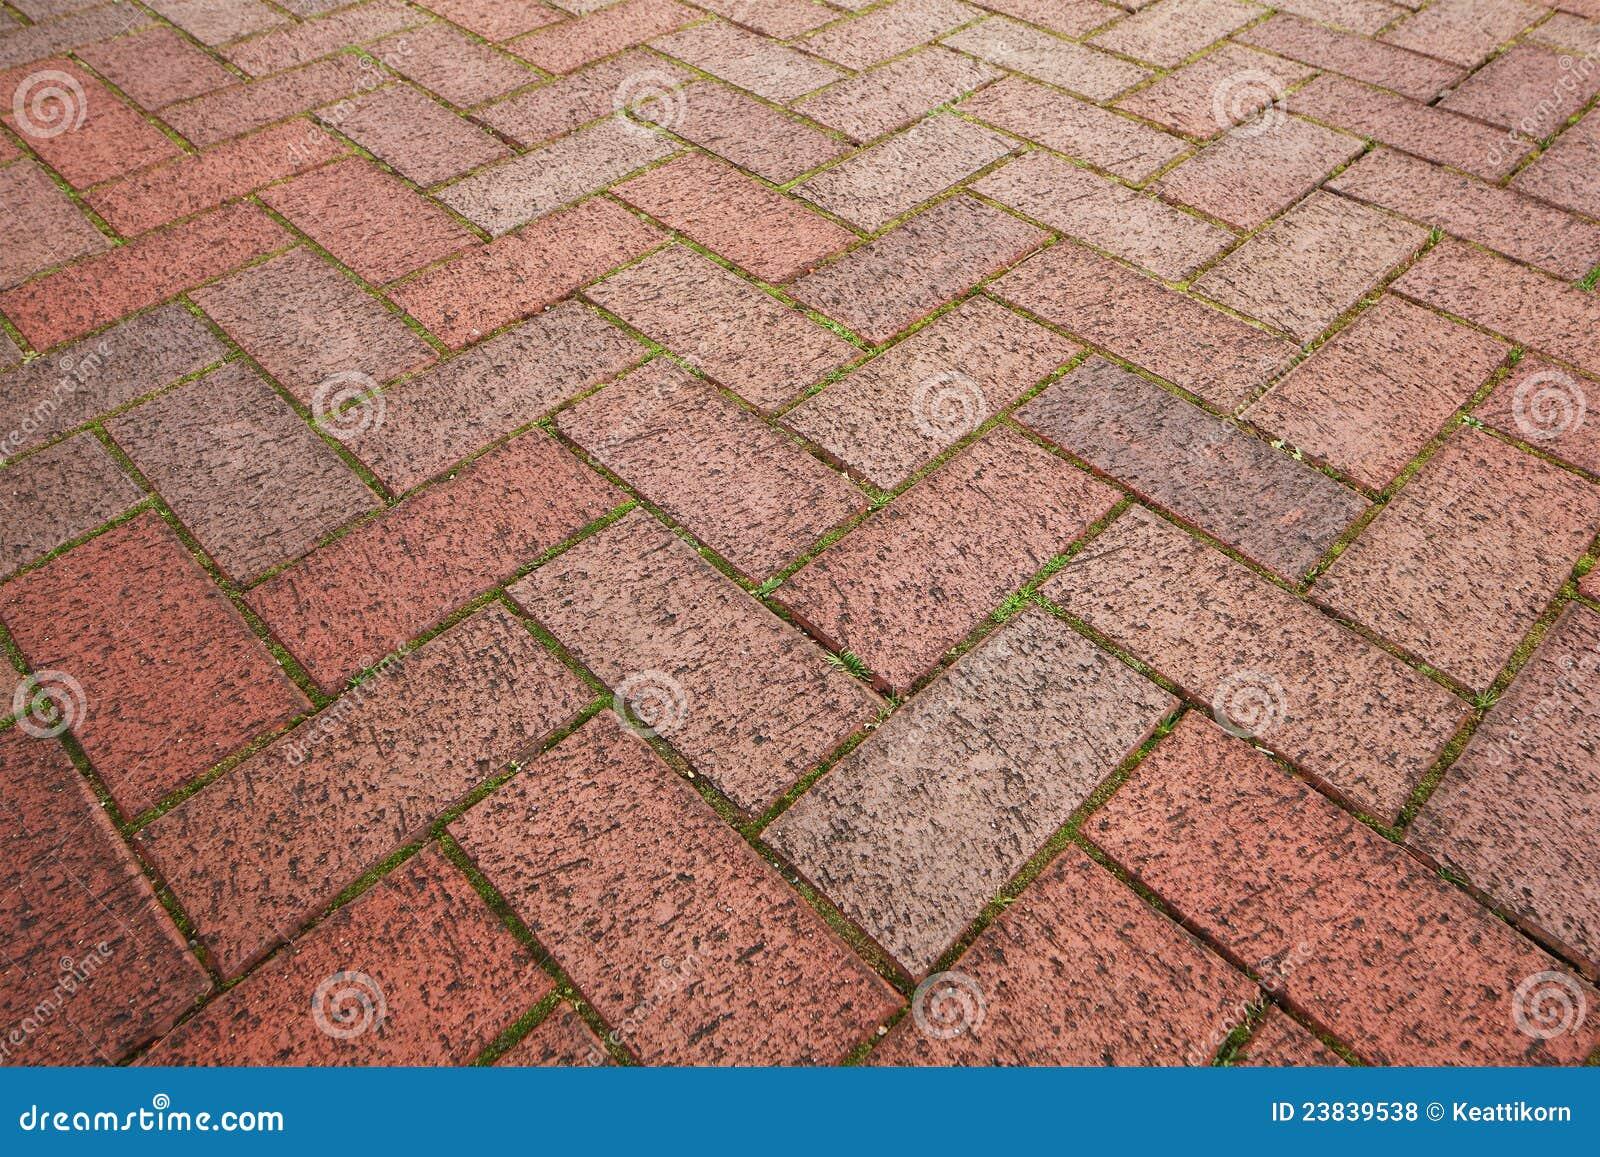 Z Brick Flooring : Brick floor royalty free stock photos image